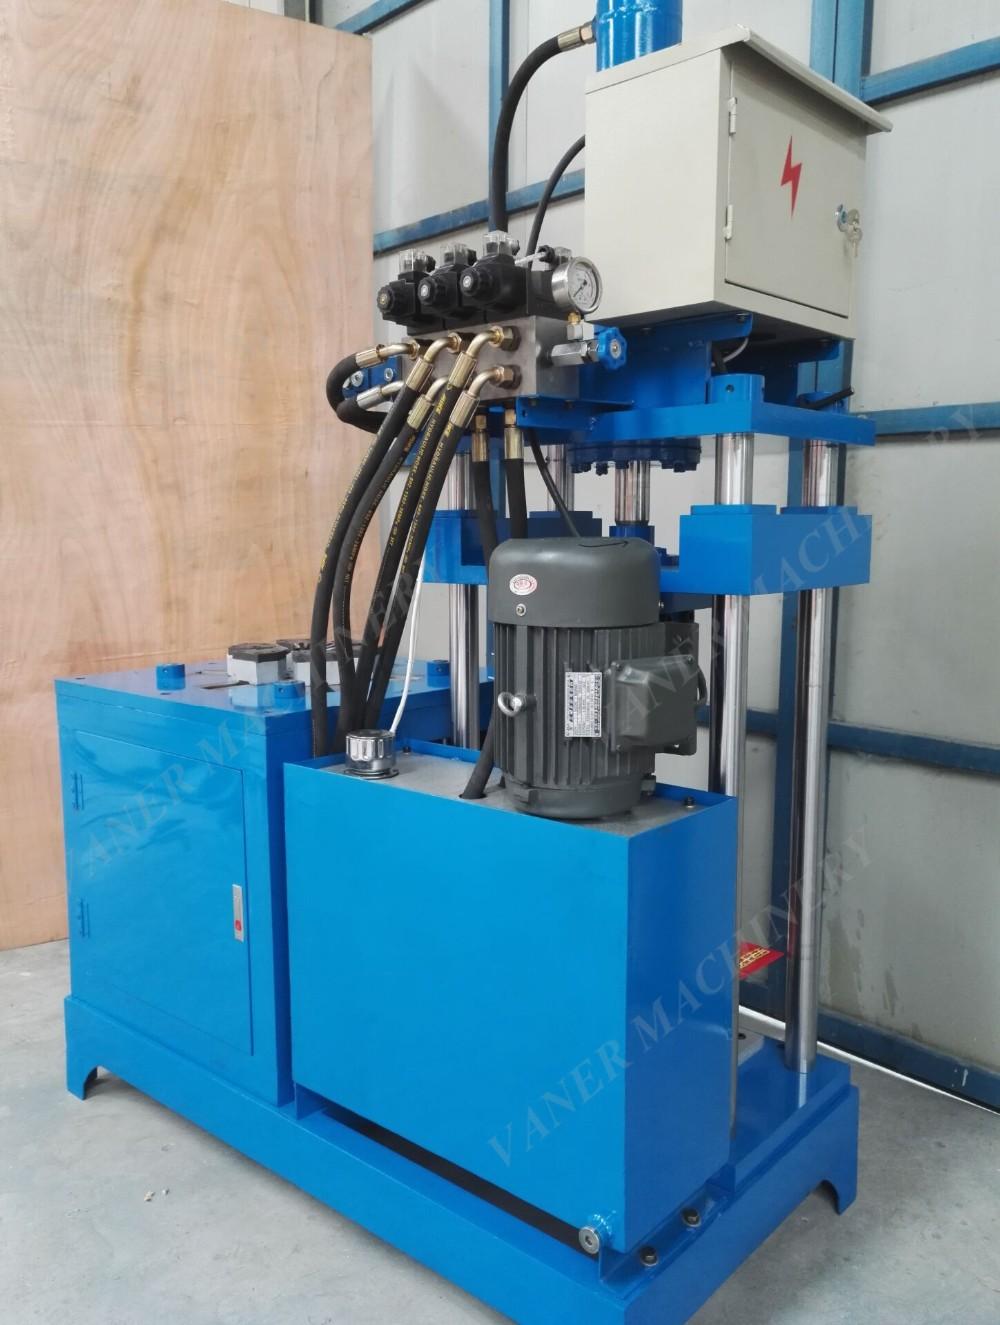 Rotor Stator Cutting Machine Buy Rotor Stator Cutting